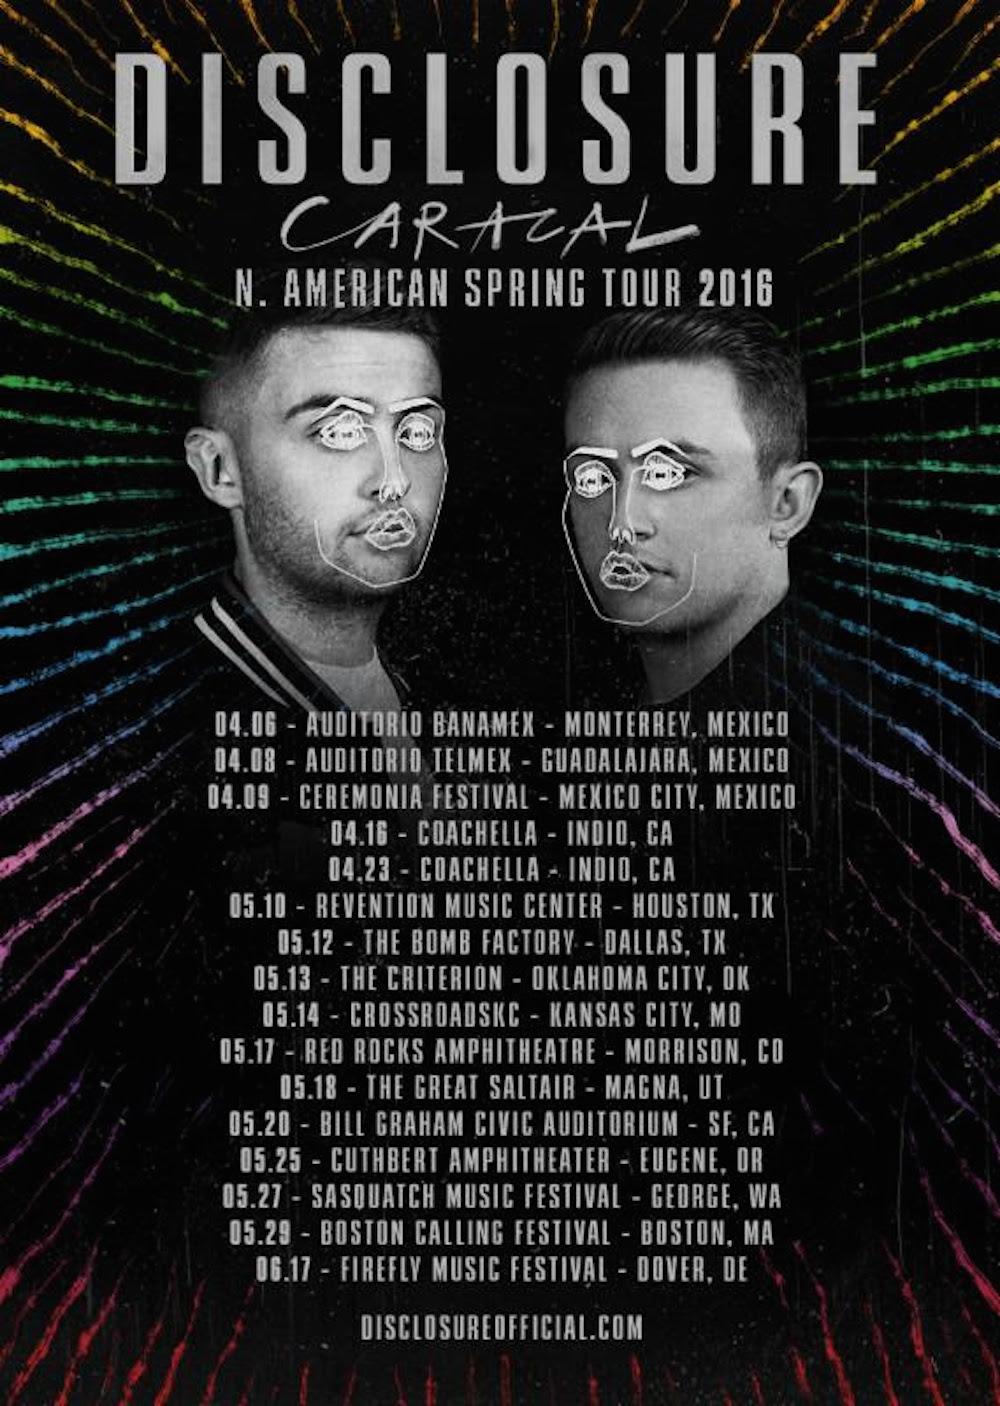 disclosure 2016 tour Disclosure announce 2016 North American tour